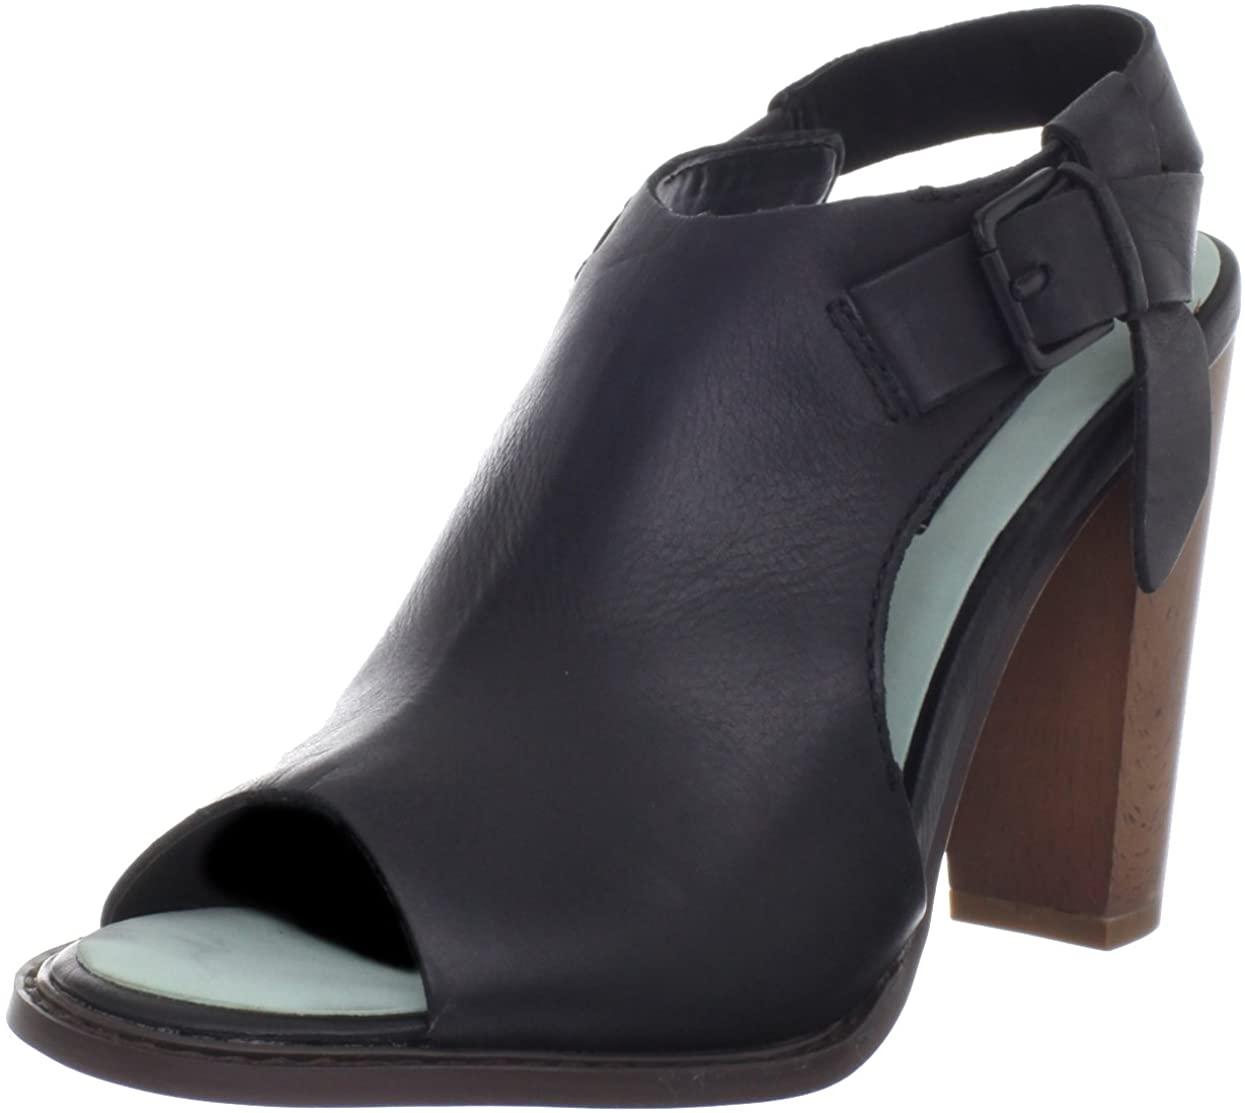 CK Jeans Women's Sallie Sandal